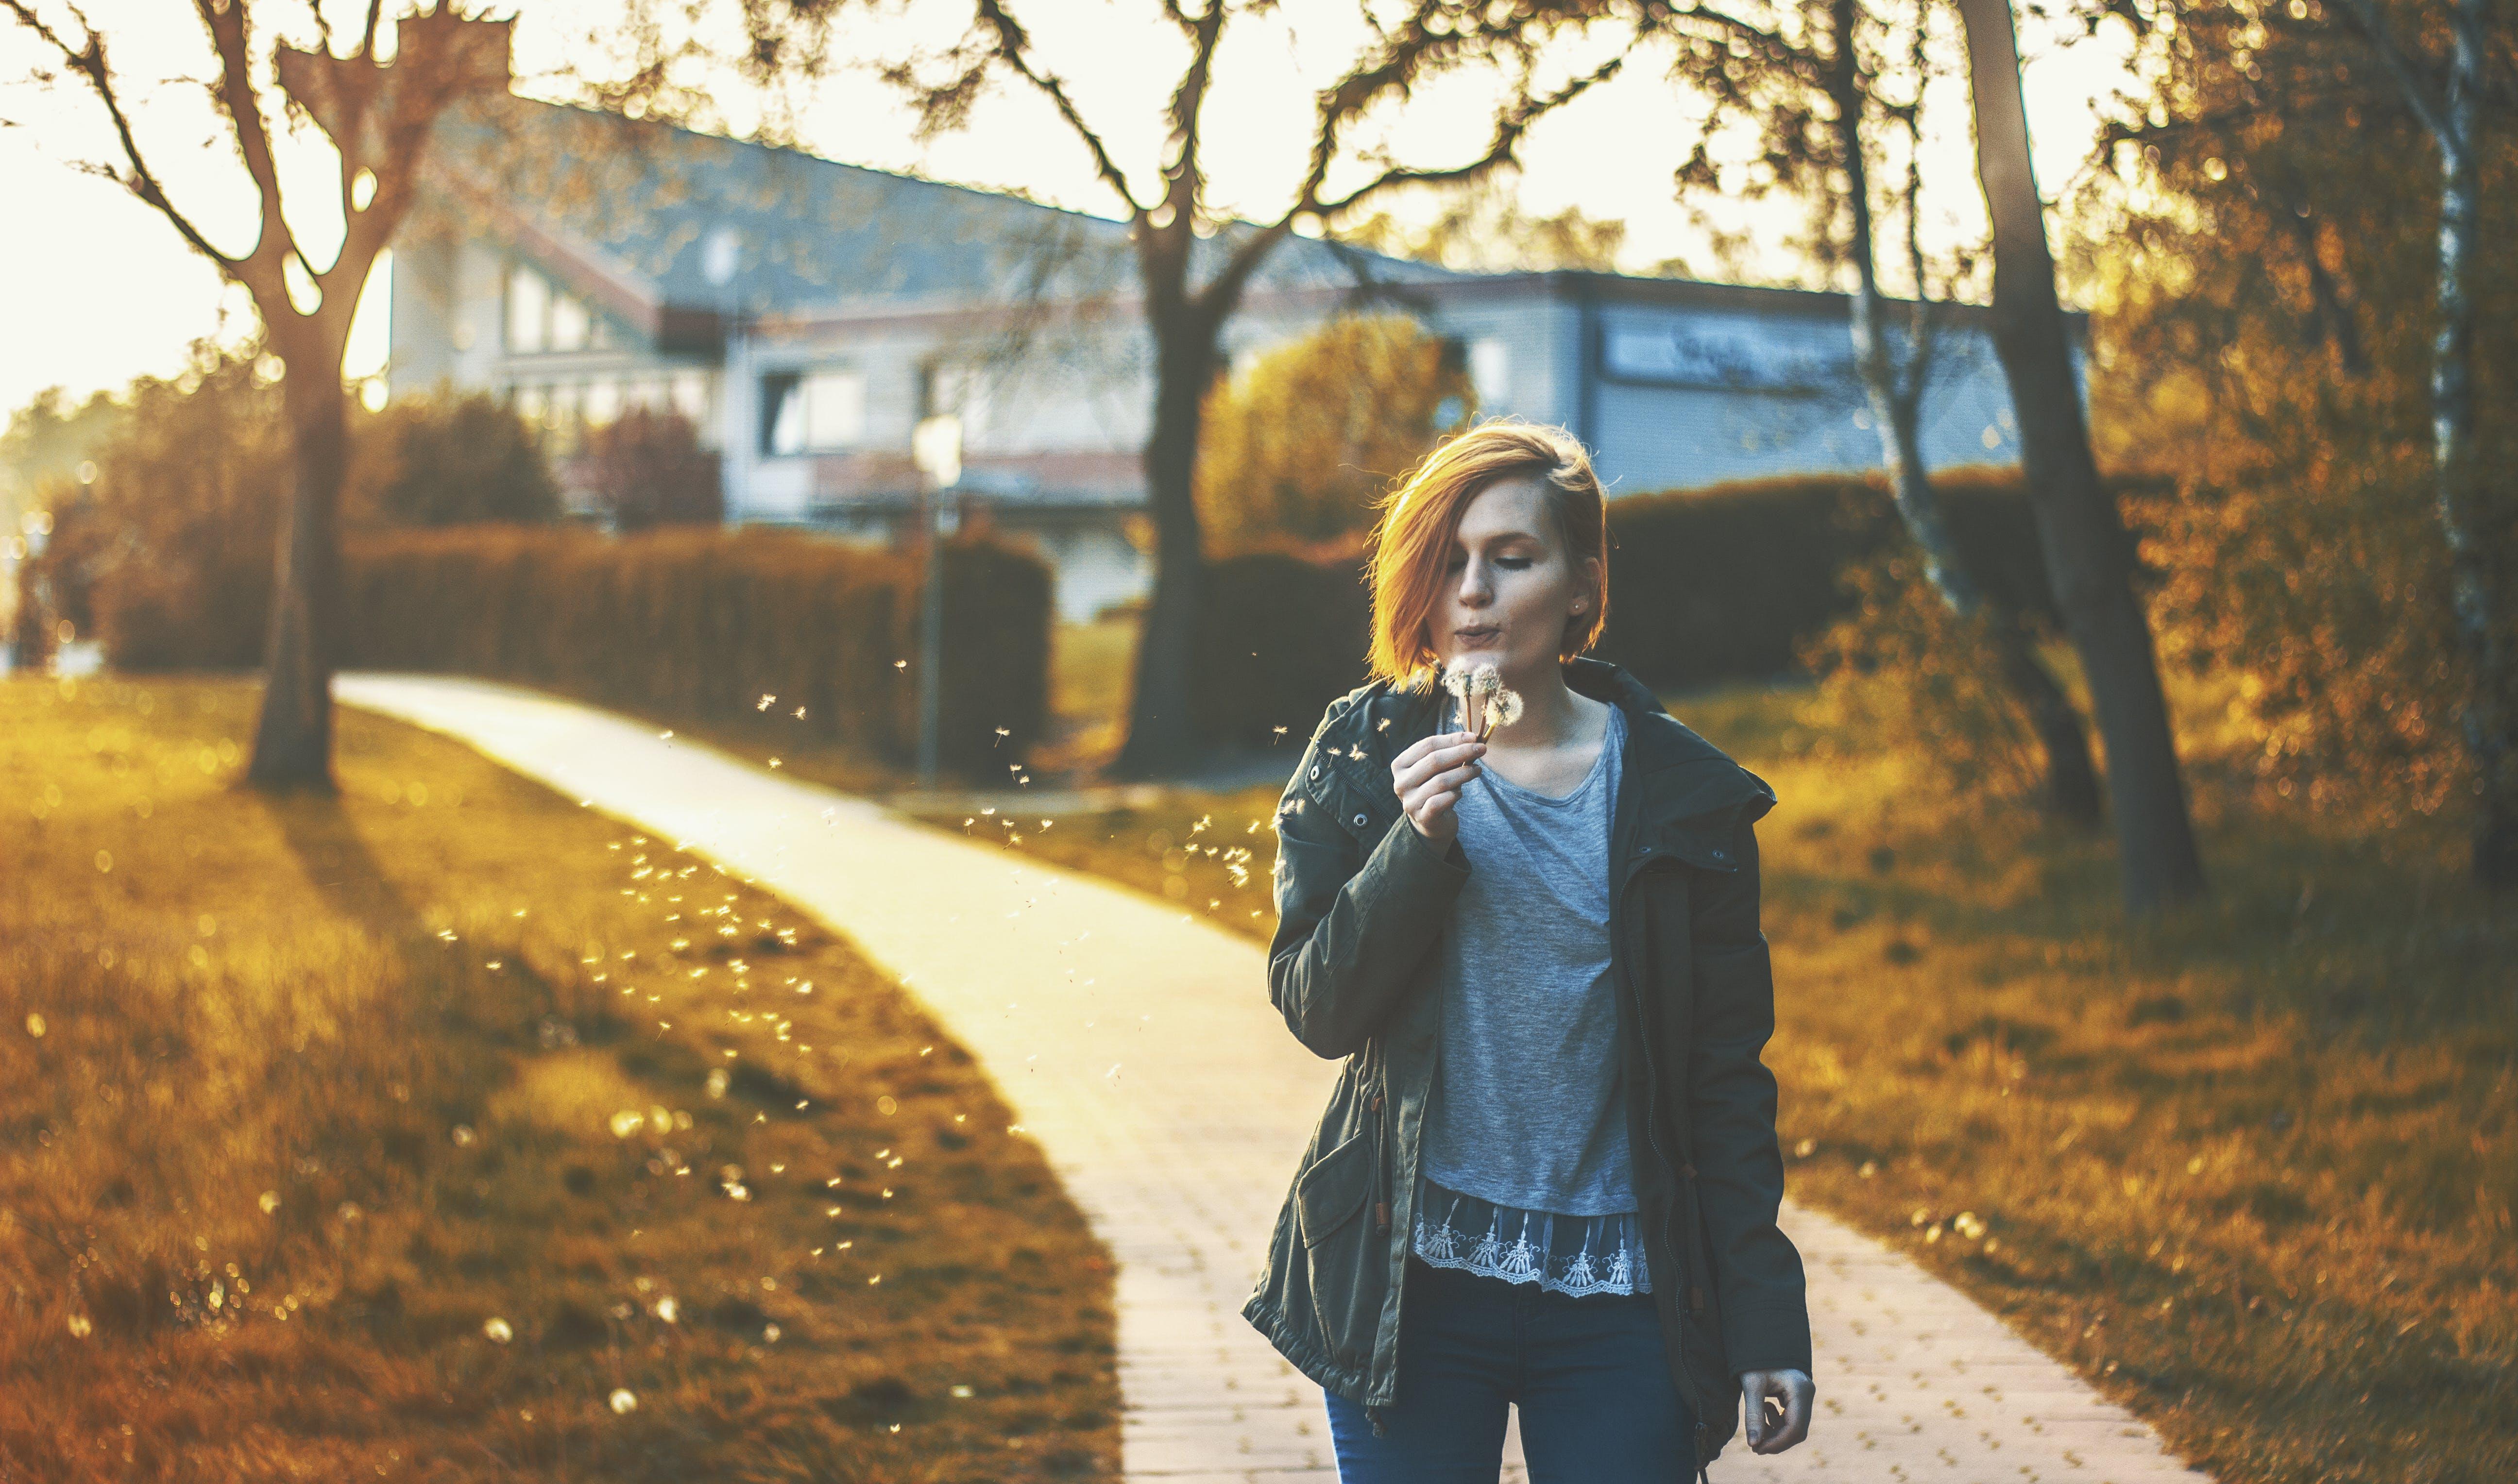 Woman Blowing Dandelion Flower Standing on Pathway